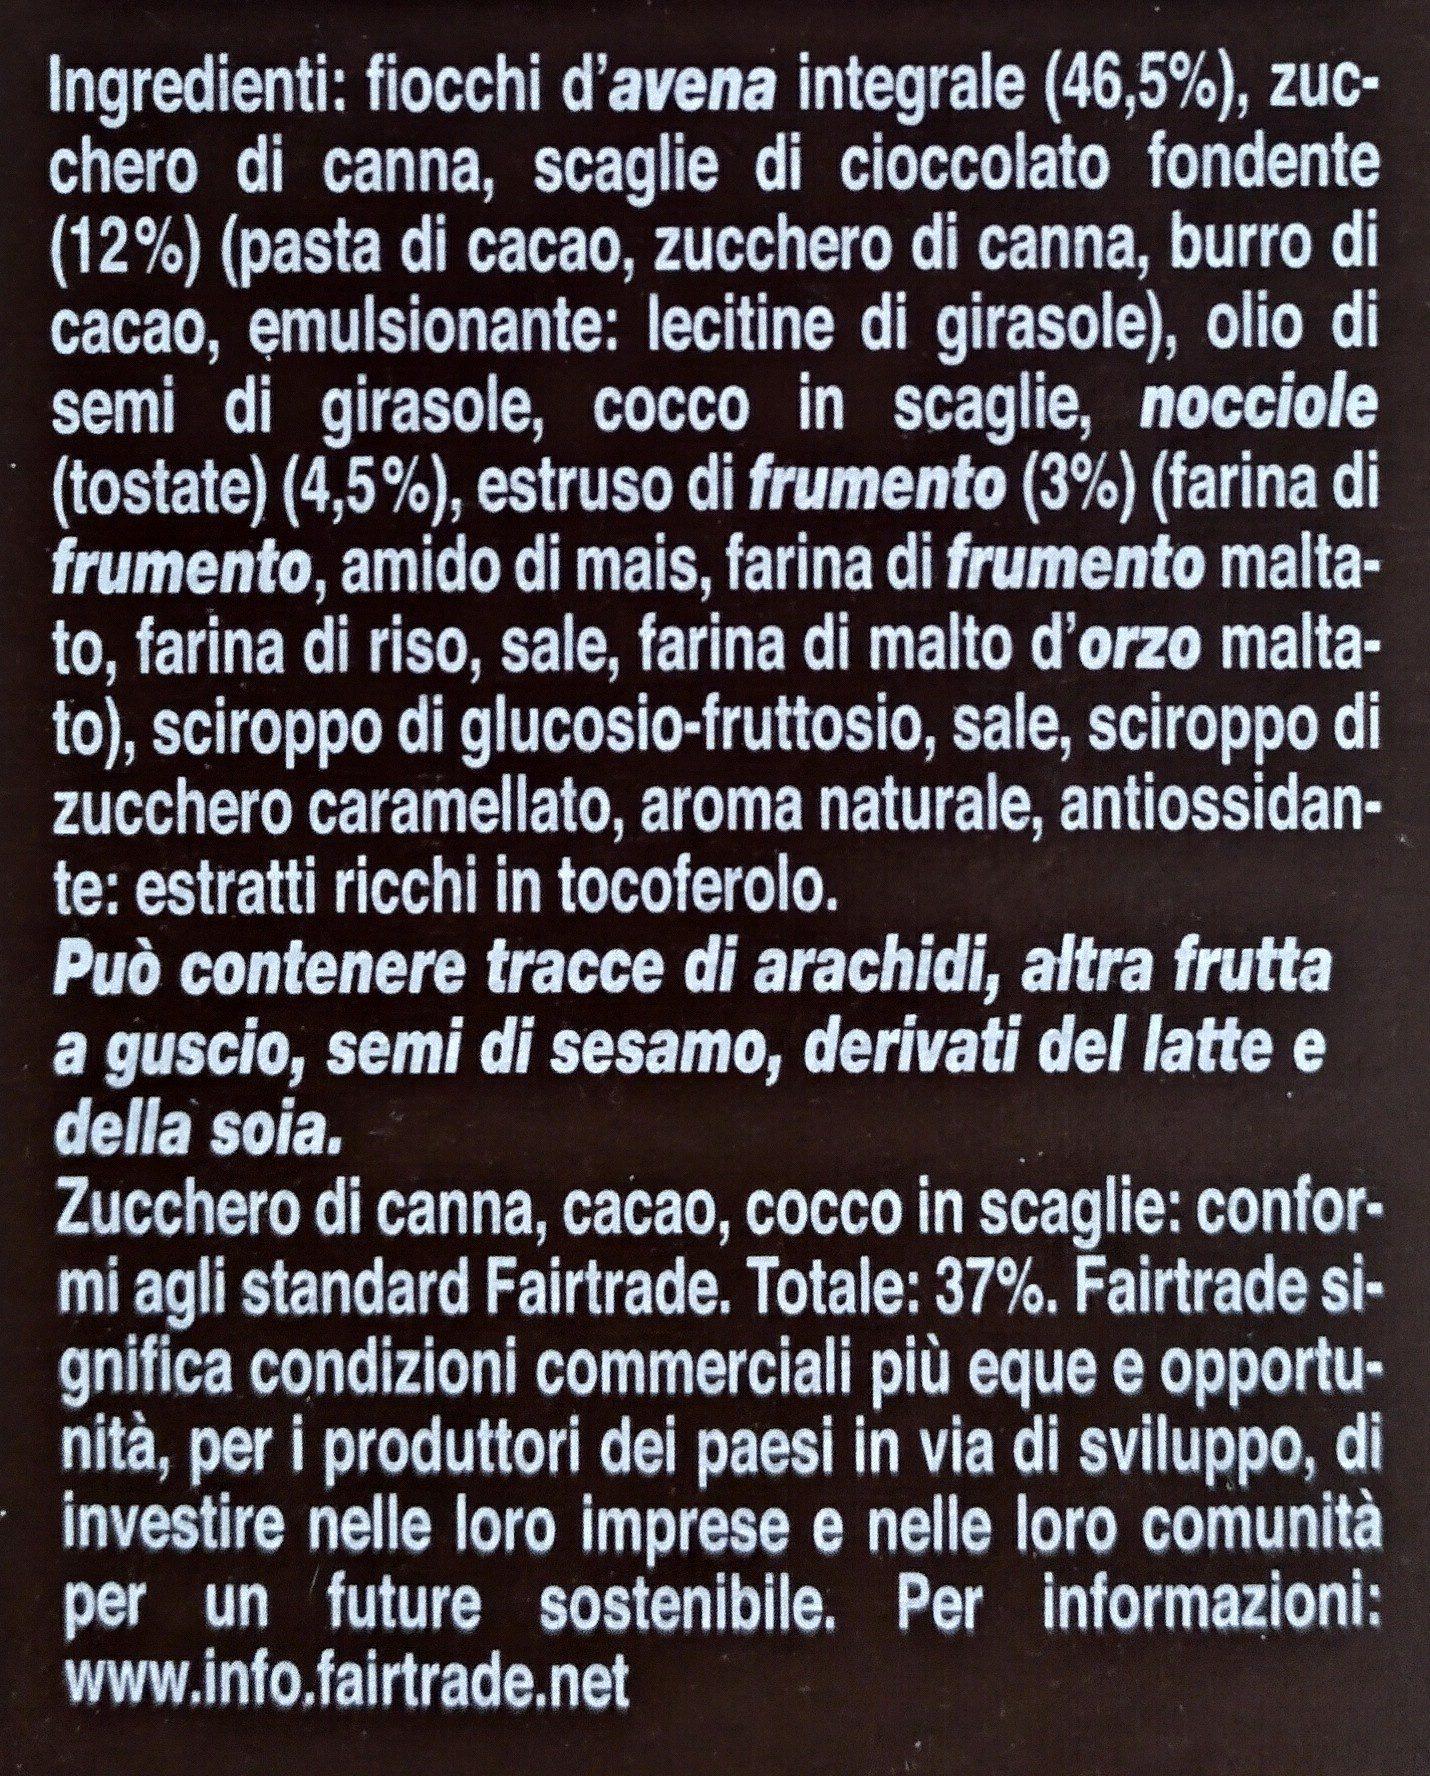 muesli croccante - Ingredients - fi